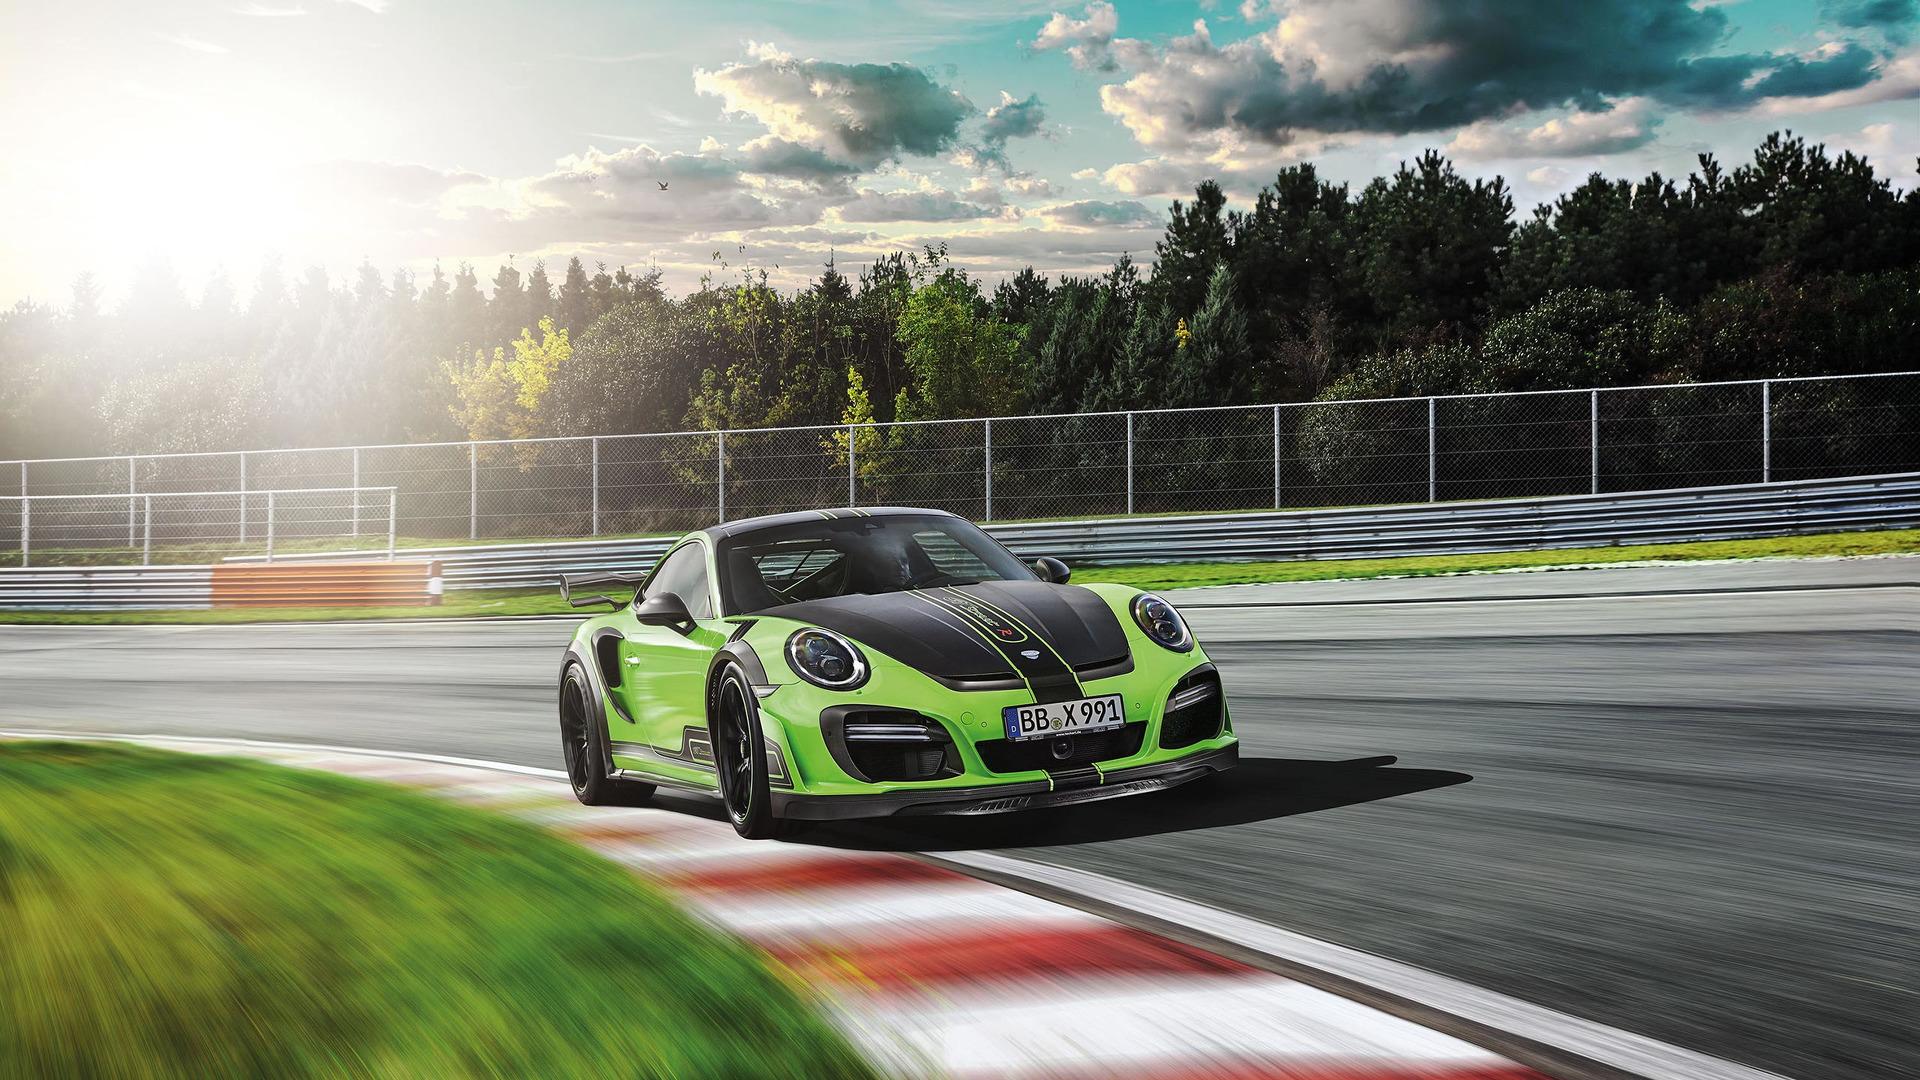 Tuned Porsche 911 Turbo has 711 hp, high-tech exhaust makes it sing